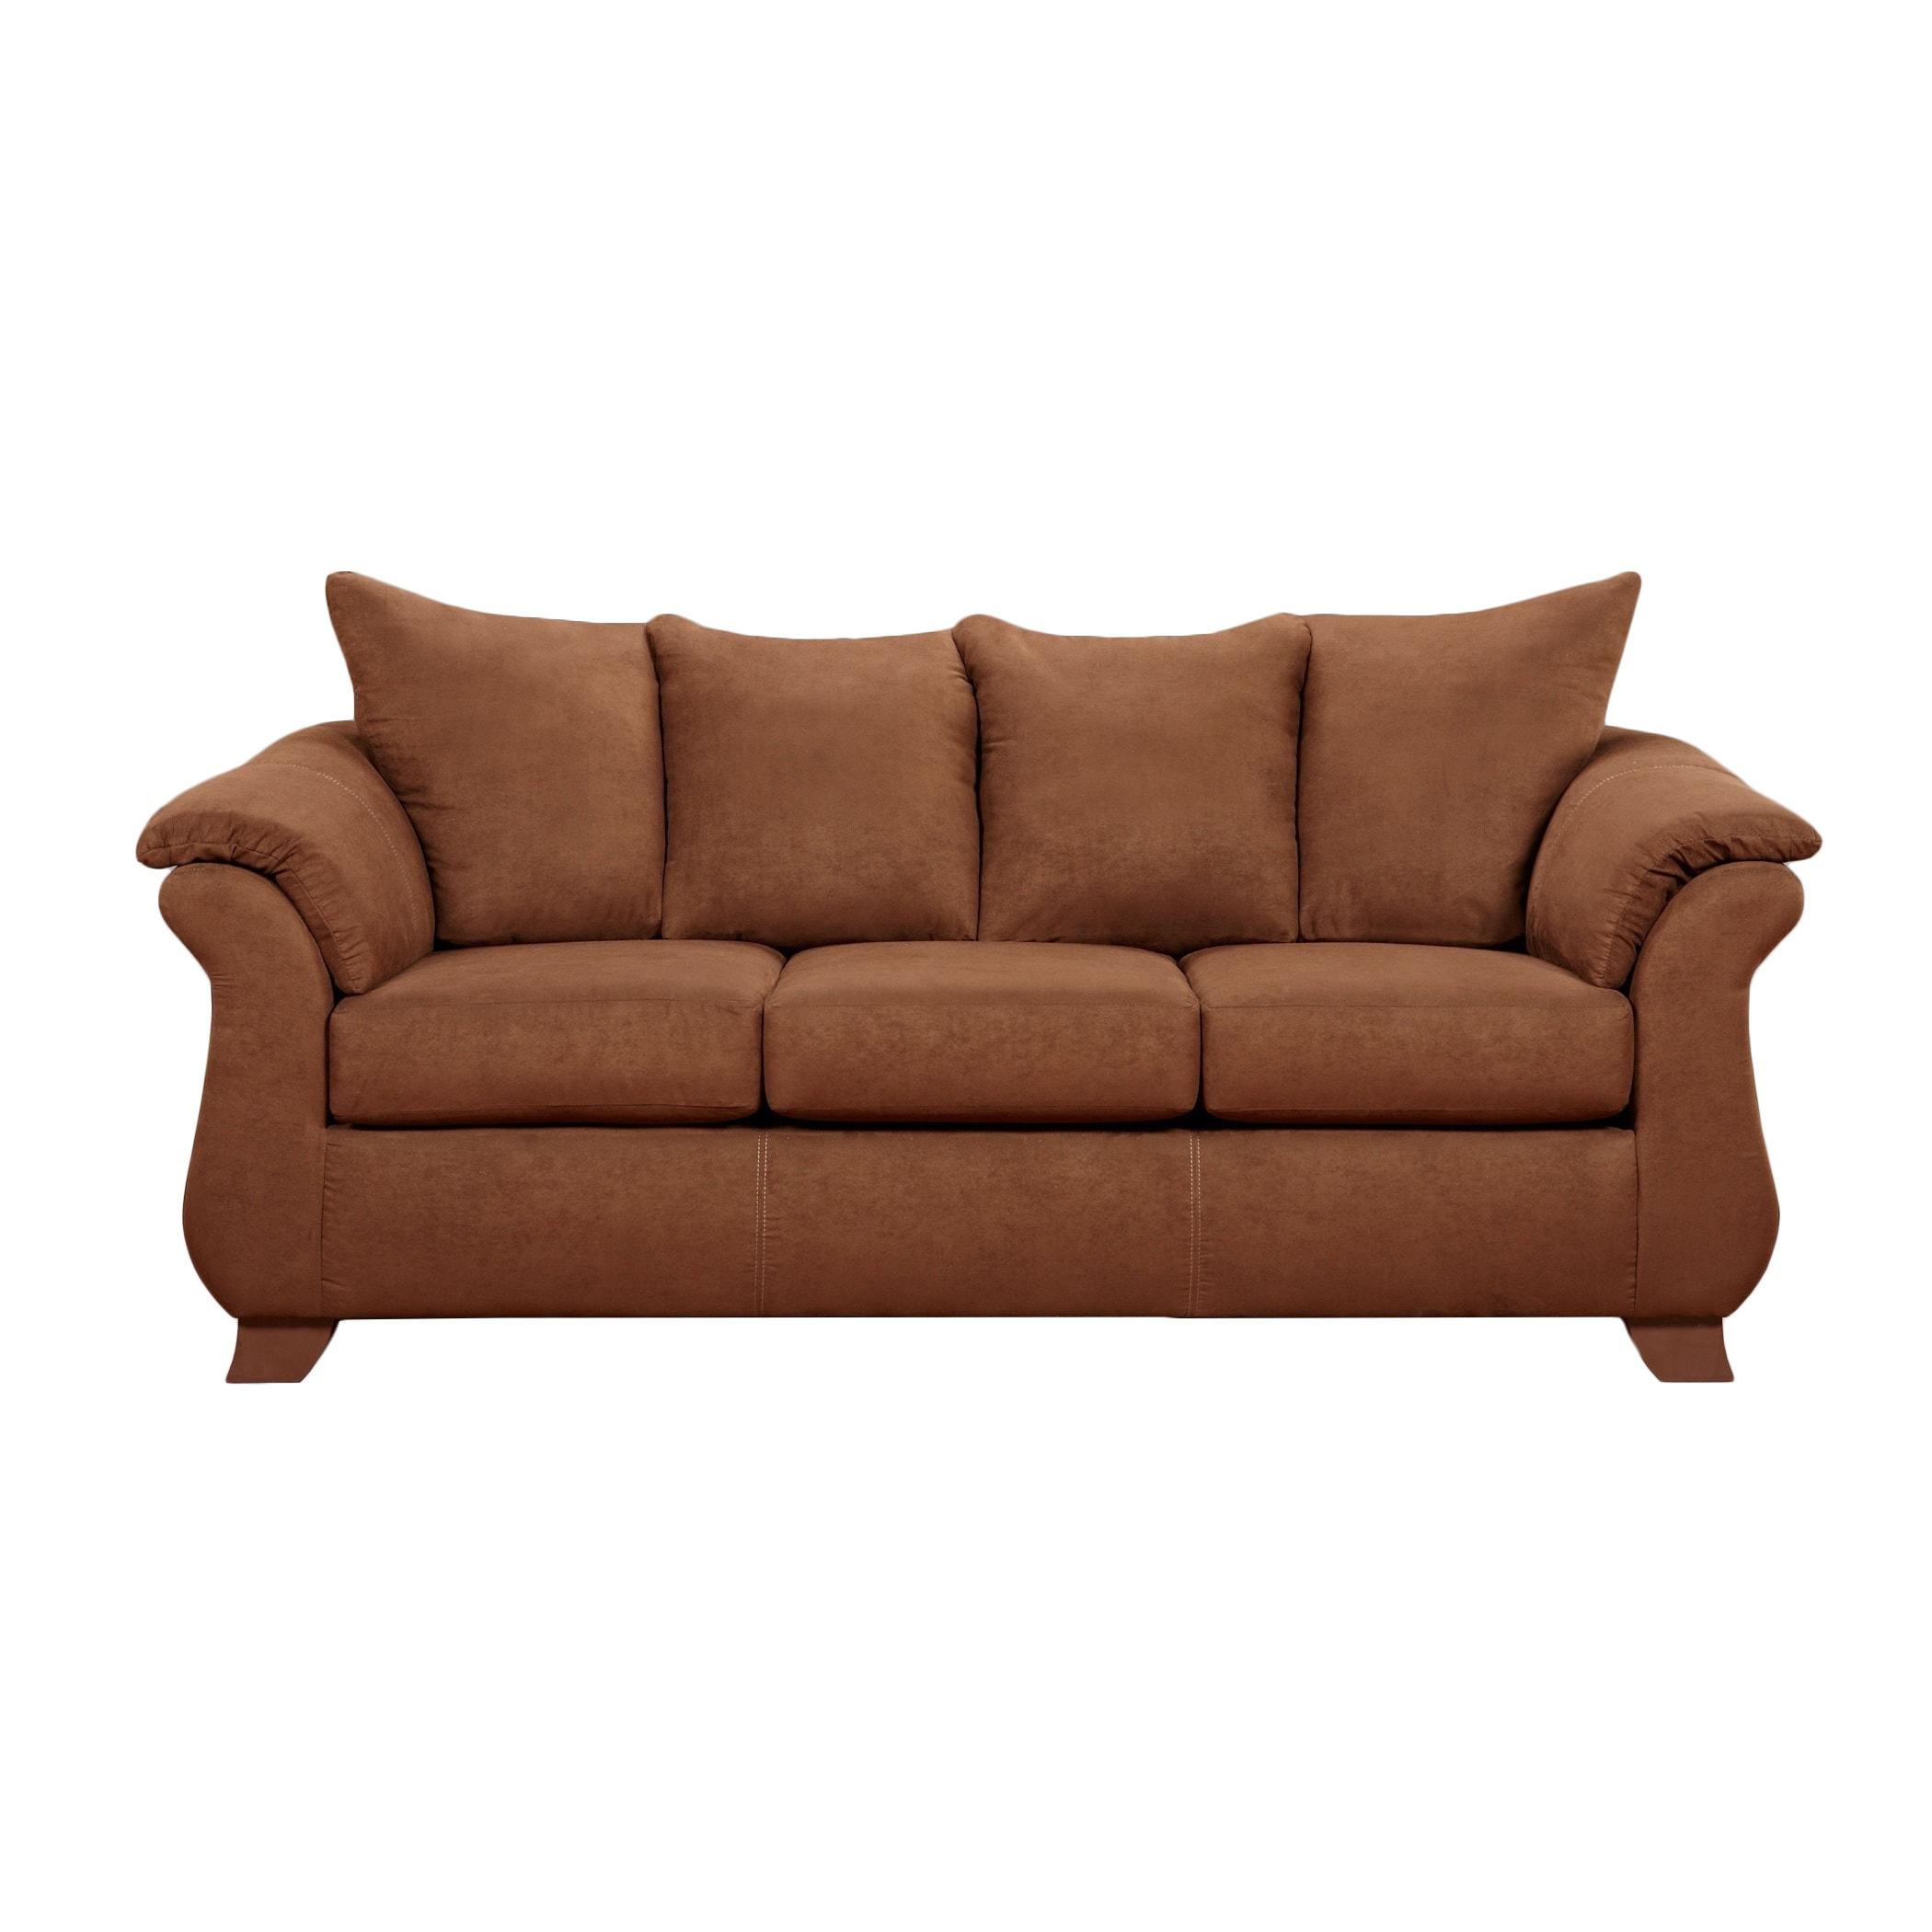 ashley manor harriet sofa in mink sofas and stuff pillow back prepossessing adelphi 2 seat